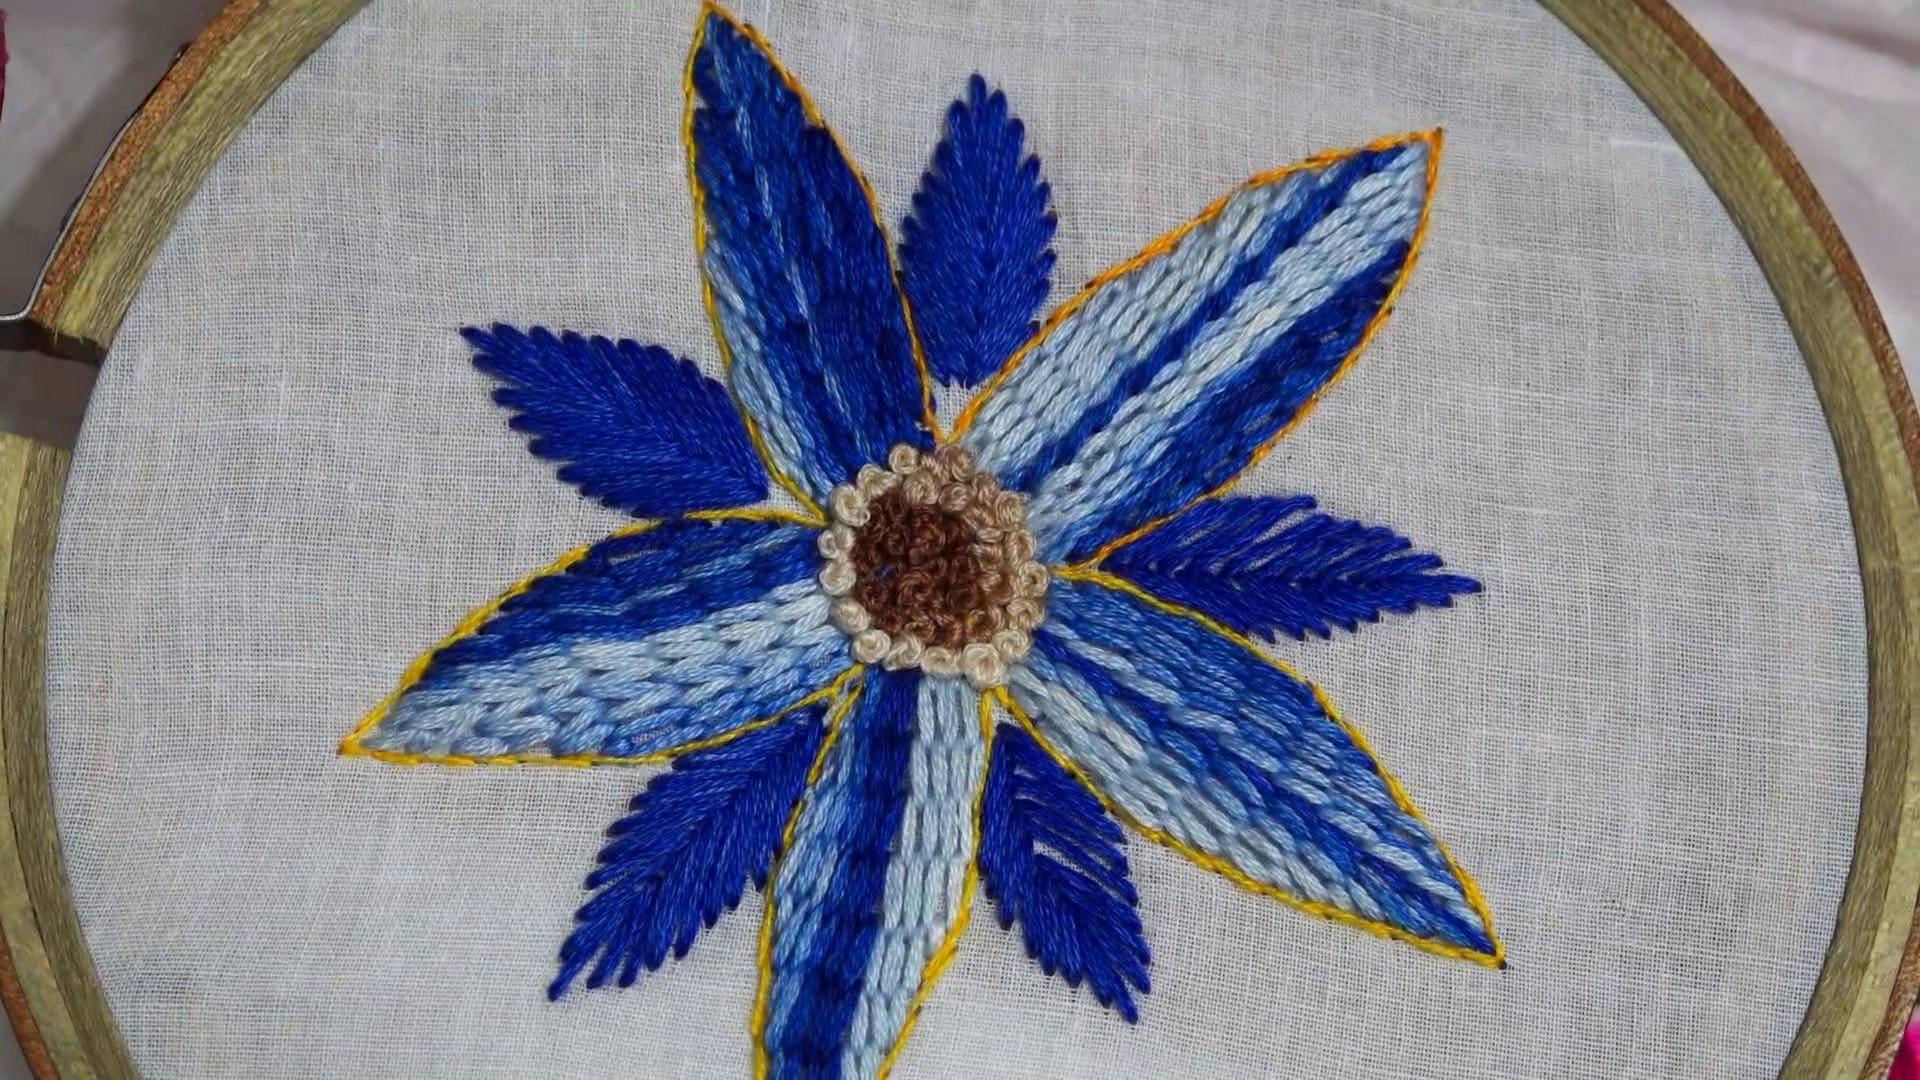 Hand Embroidery Hand Stitch Raised Stem Stitch Video Dailymotion